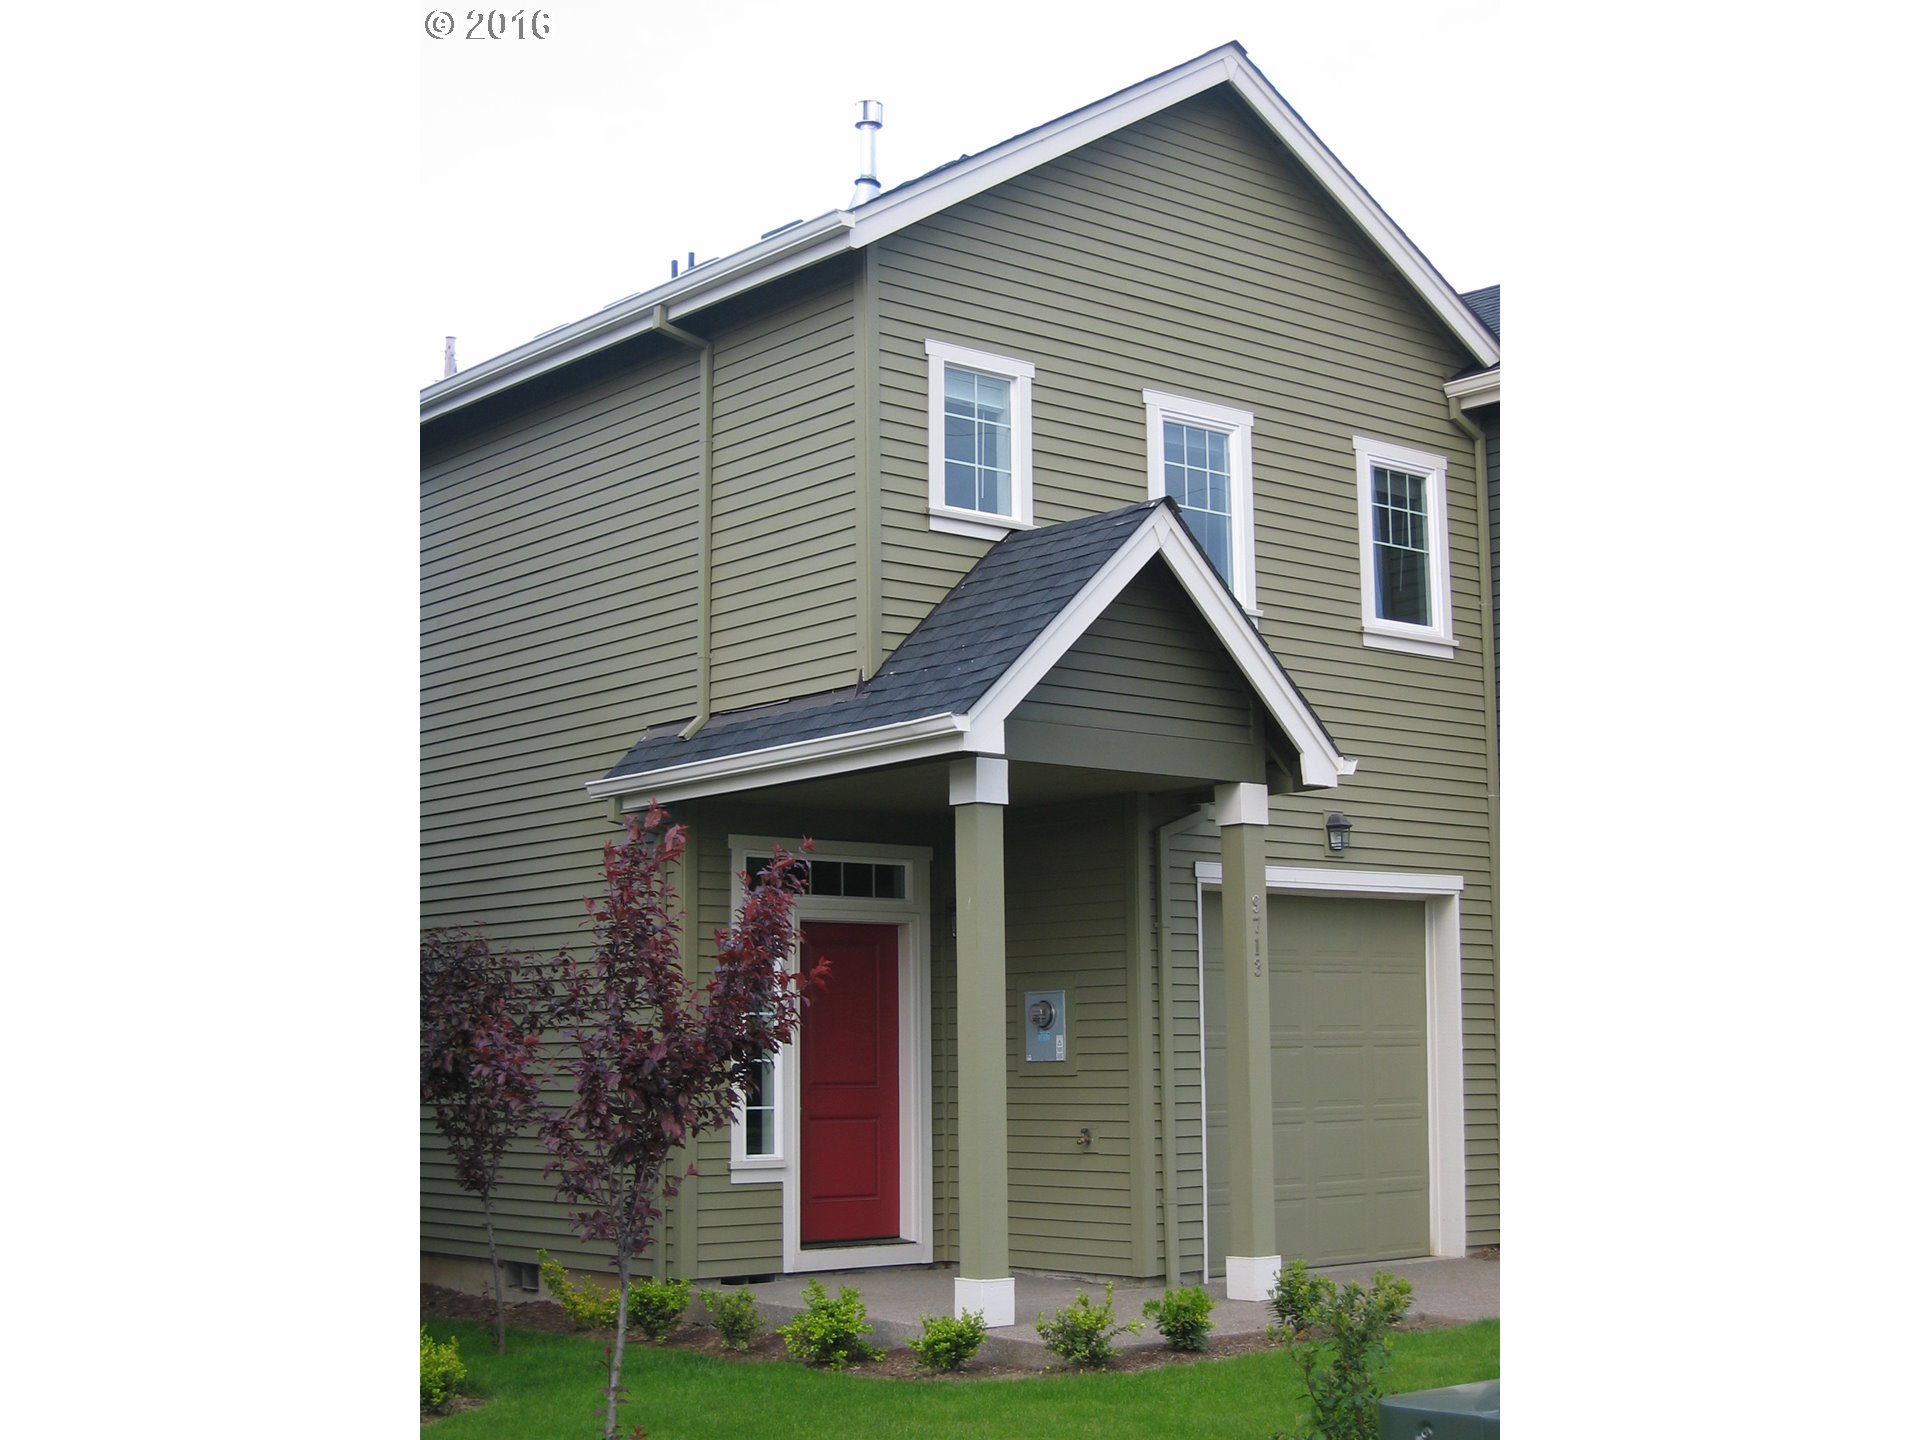 9713 N Jersey St, Portland, OR